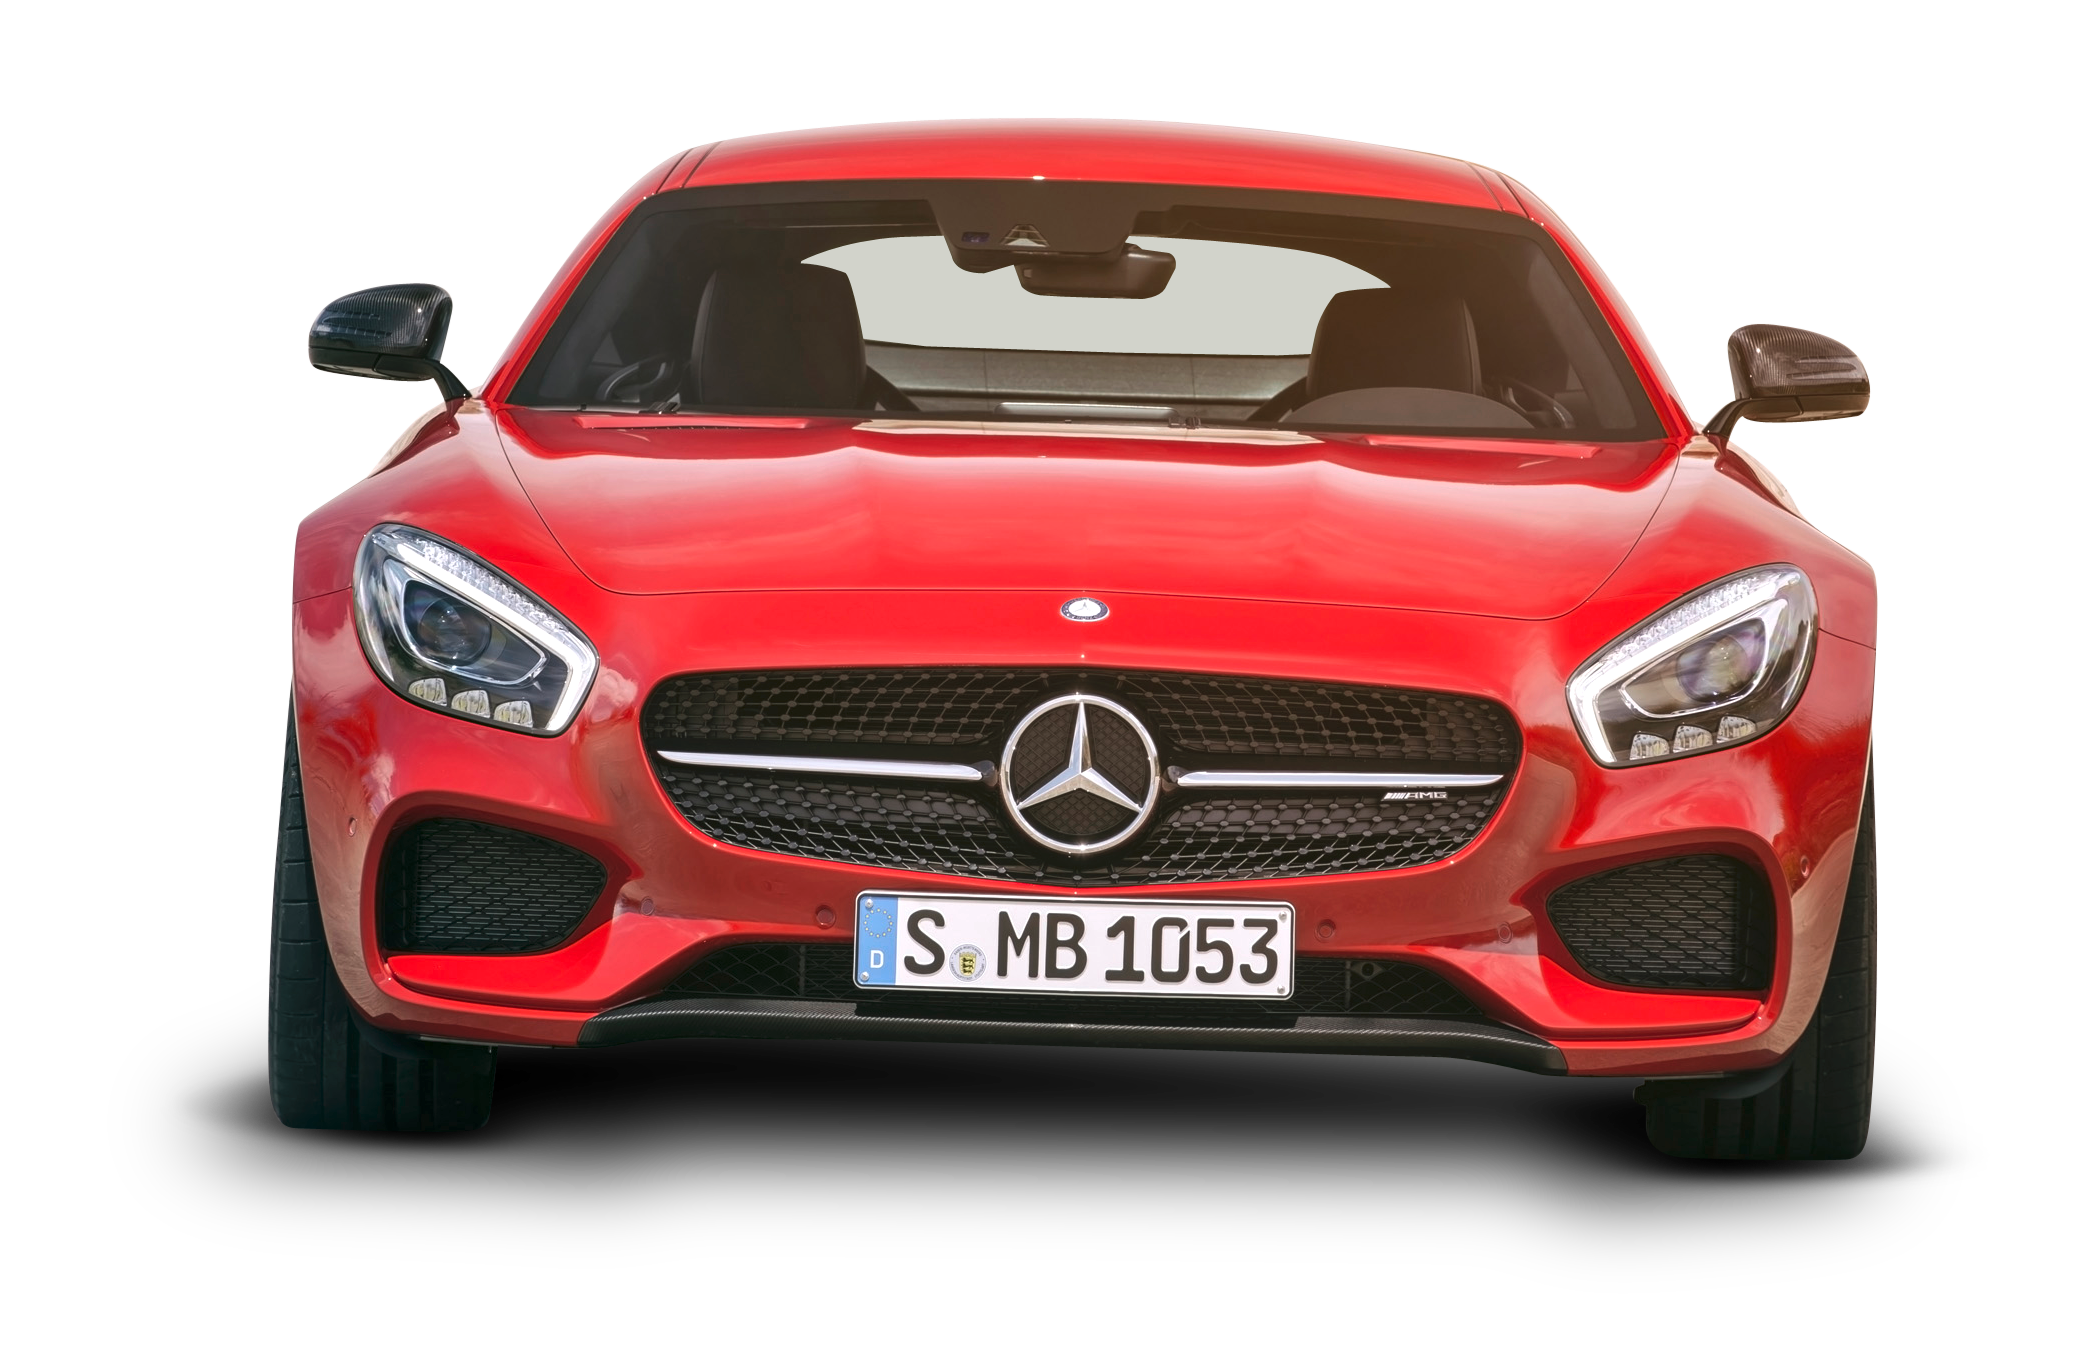 Mercedes Car Front Png Image #32712 - Car PNG